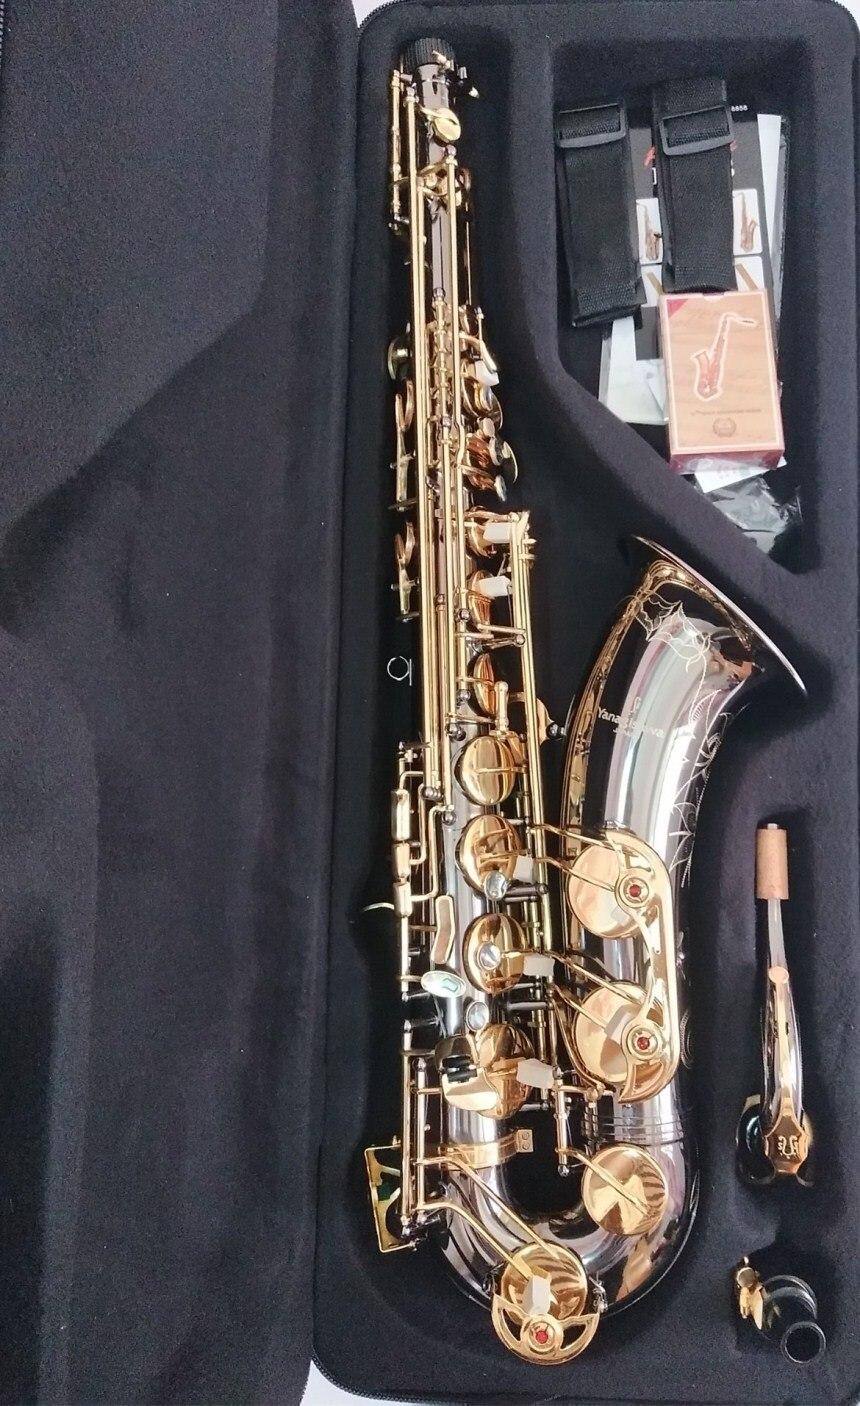 Japonês Yanagizawa T-901 Novo Bb Saxofone Tenor saxofone Tenor Alta Qualidade Super Profissional Instrumentos Musicais Livre